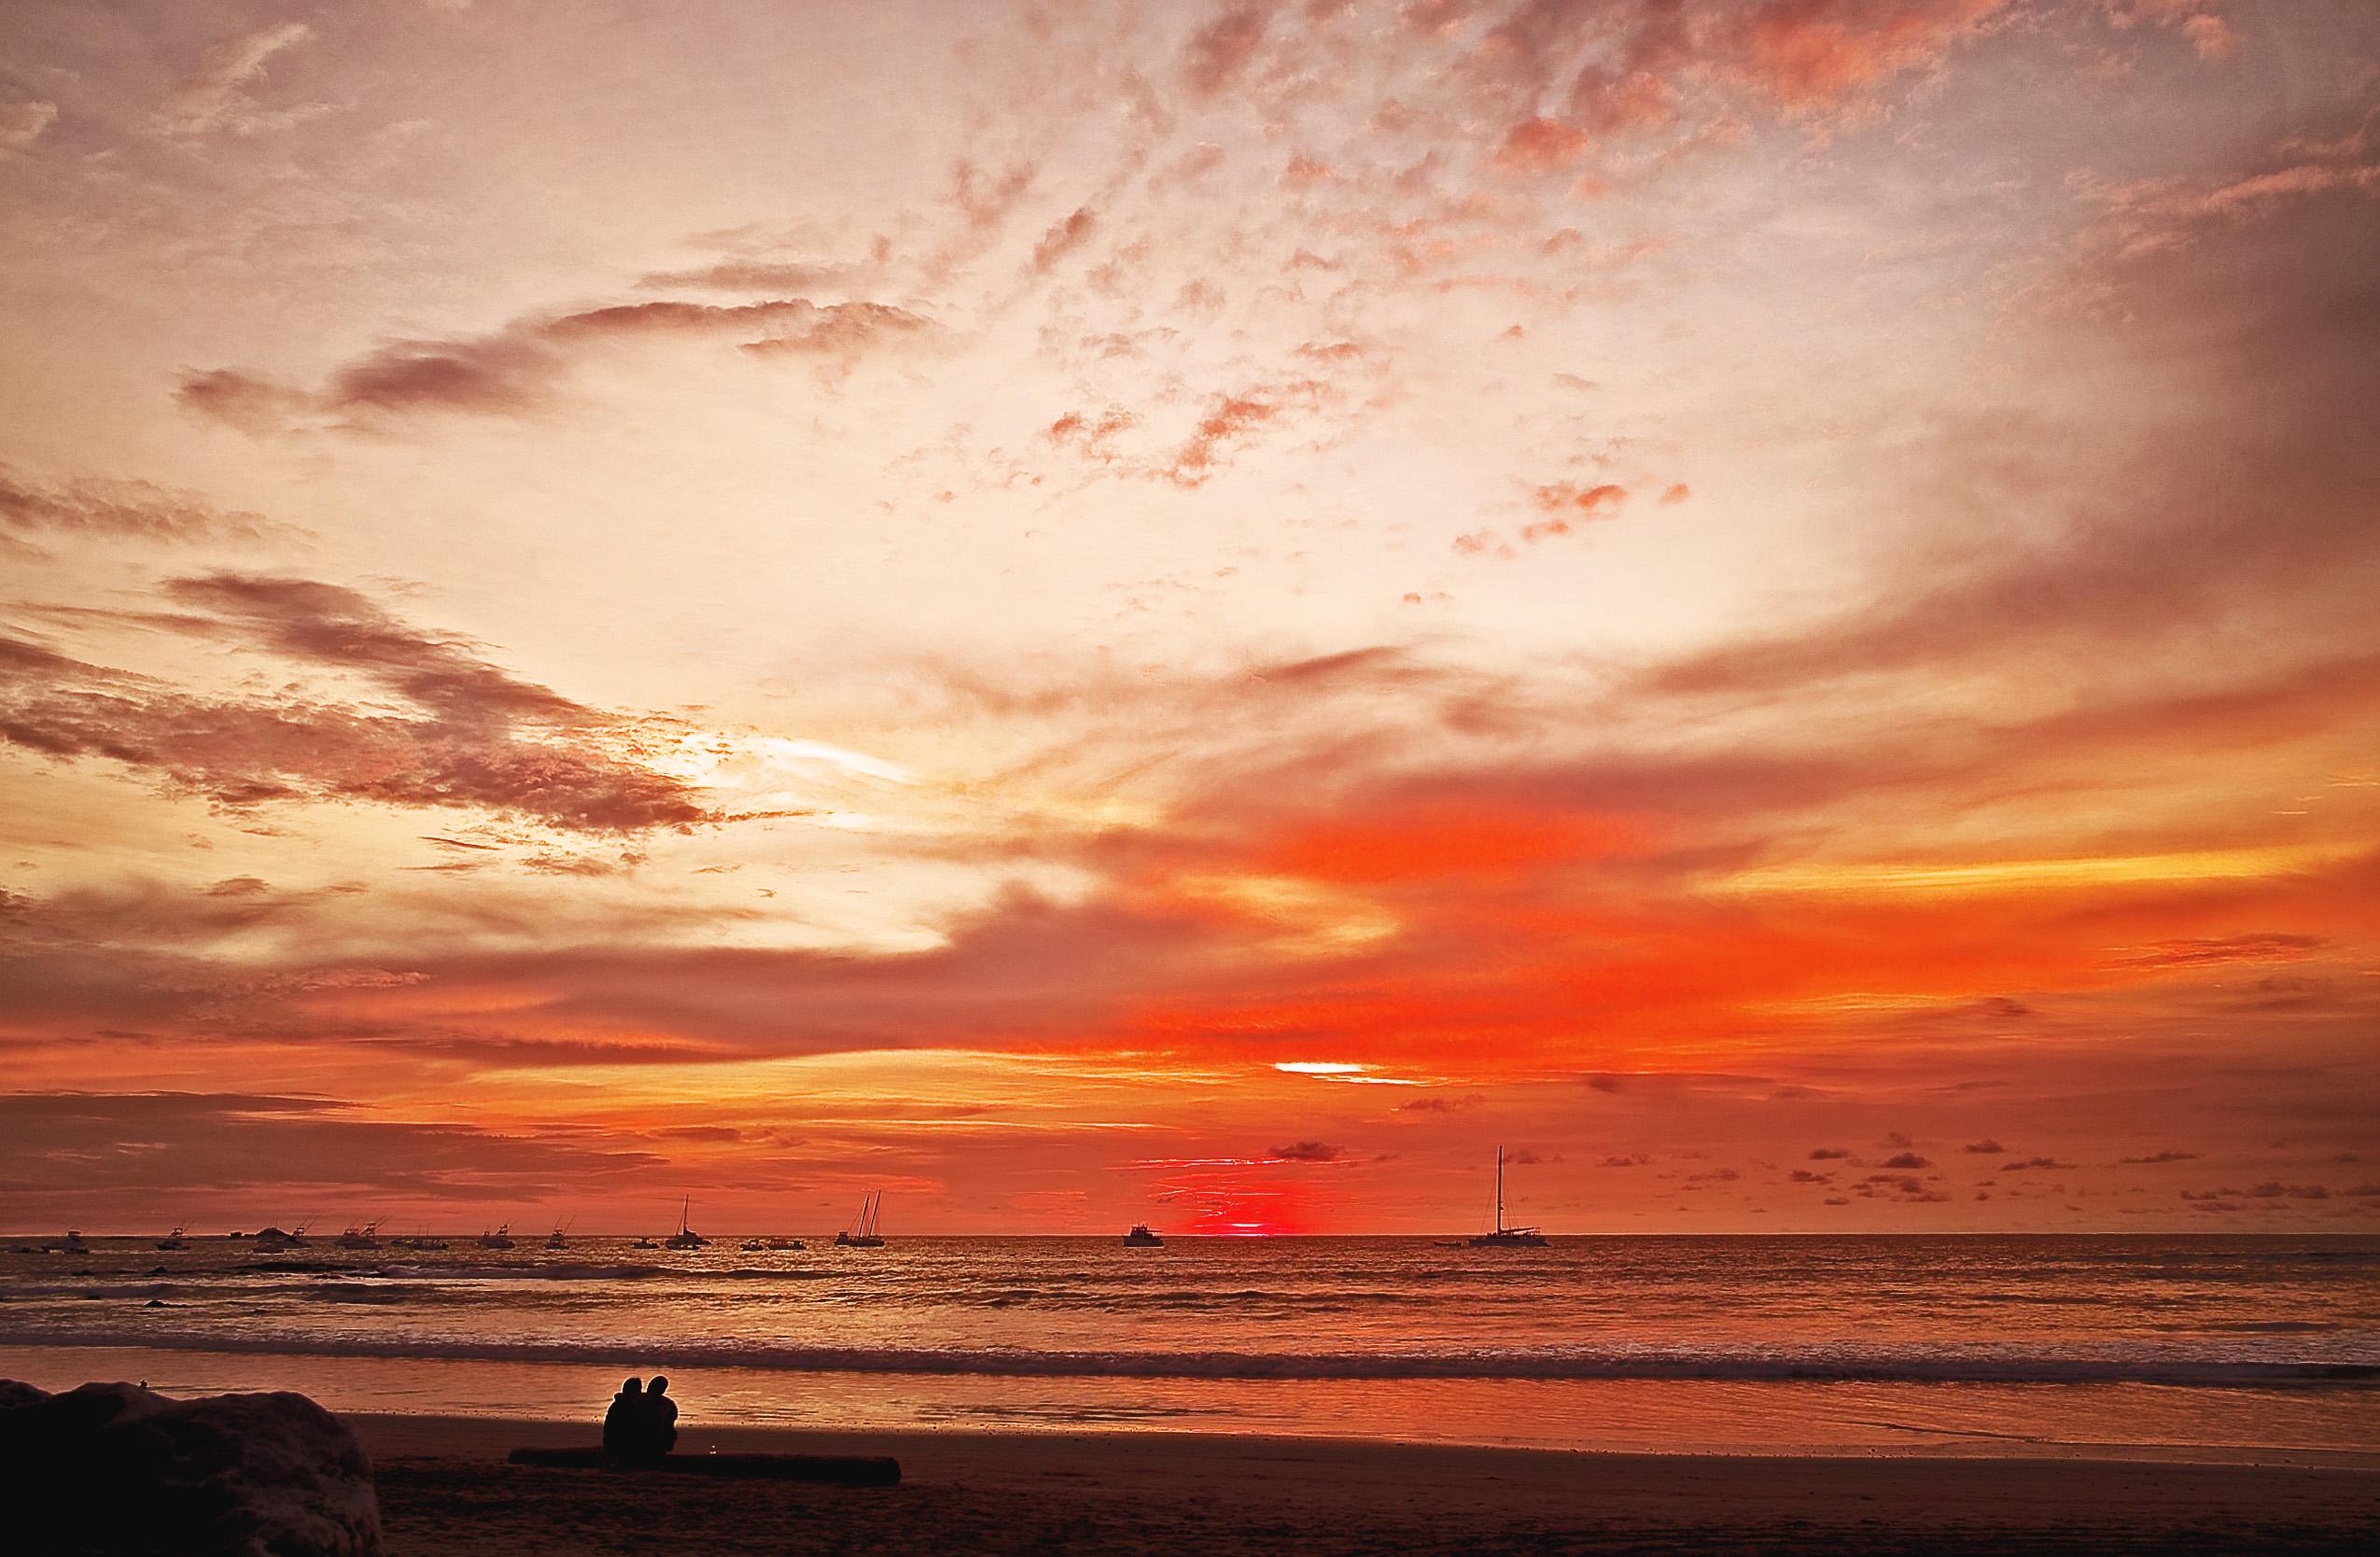 Sunset at Playa Tamarindo, Costa Rica, 5/24/11